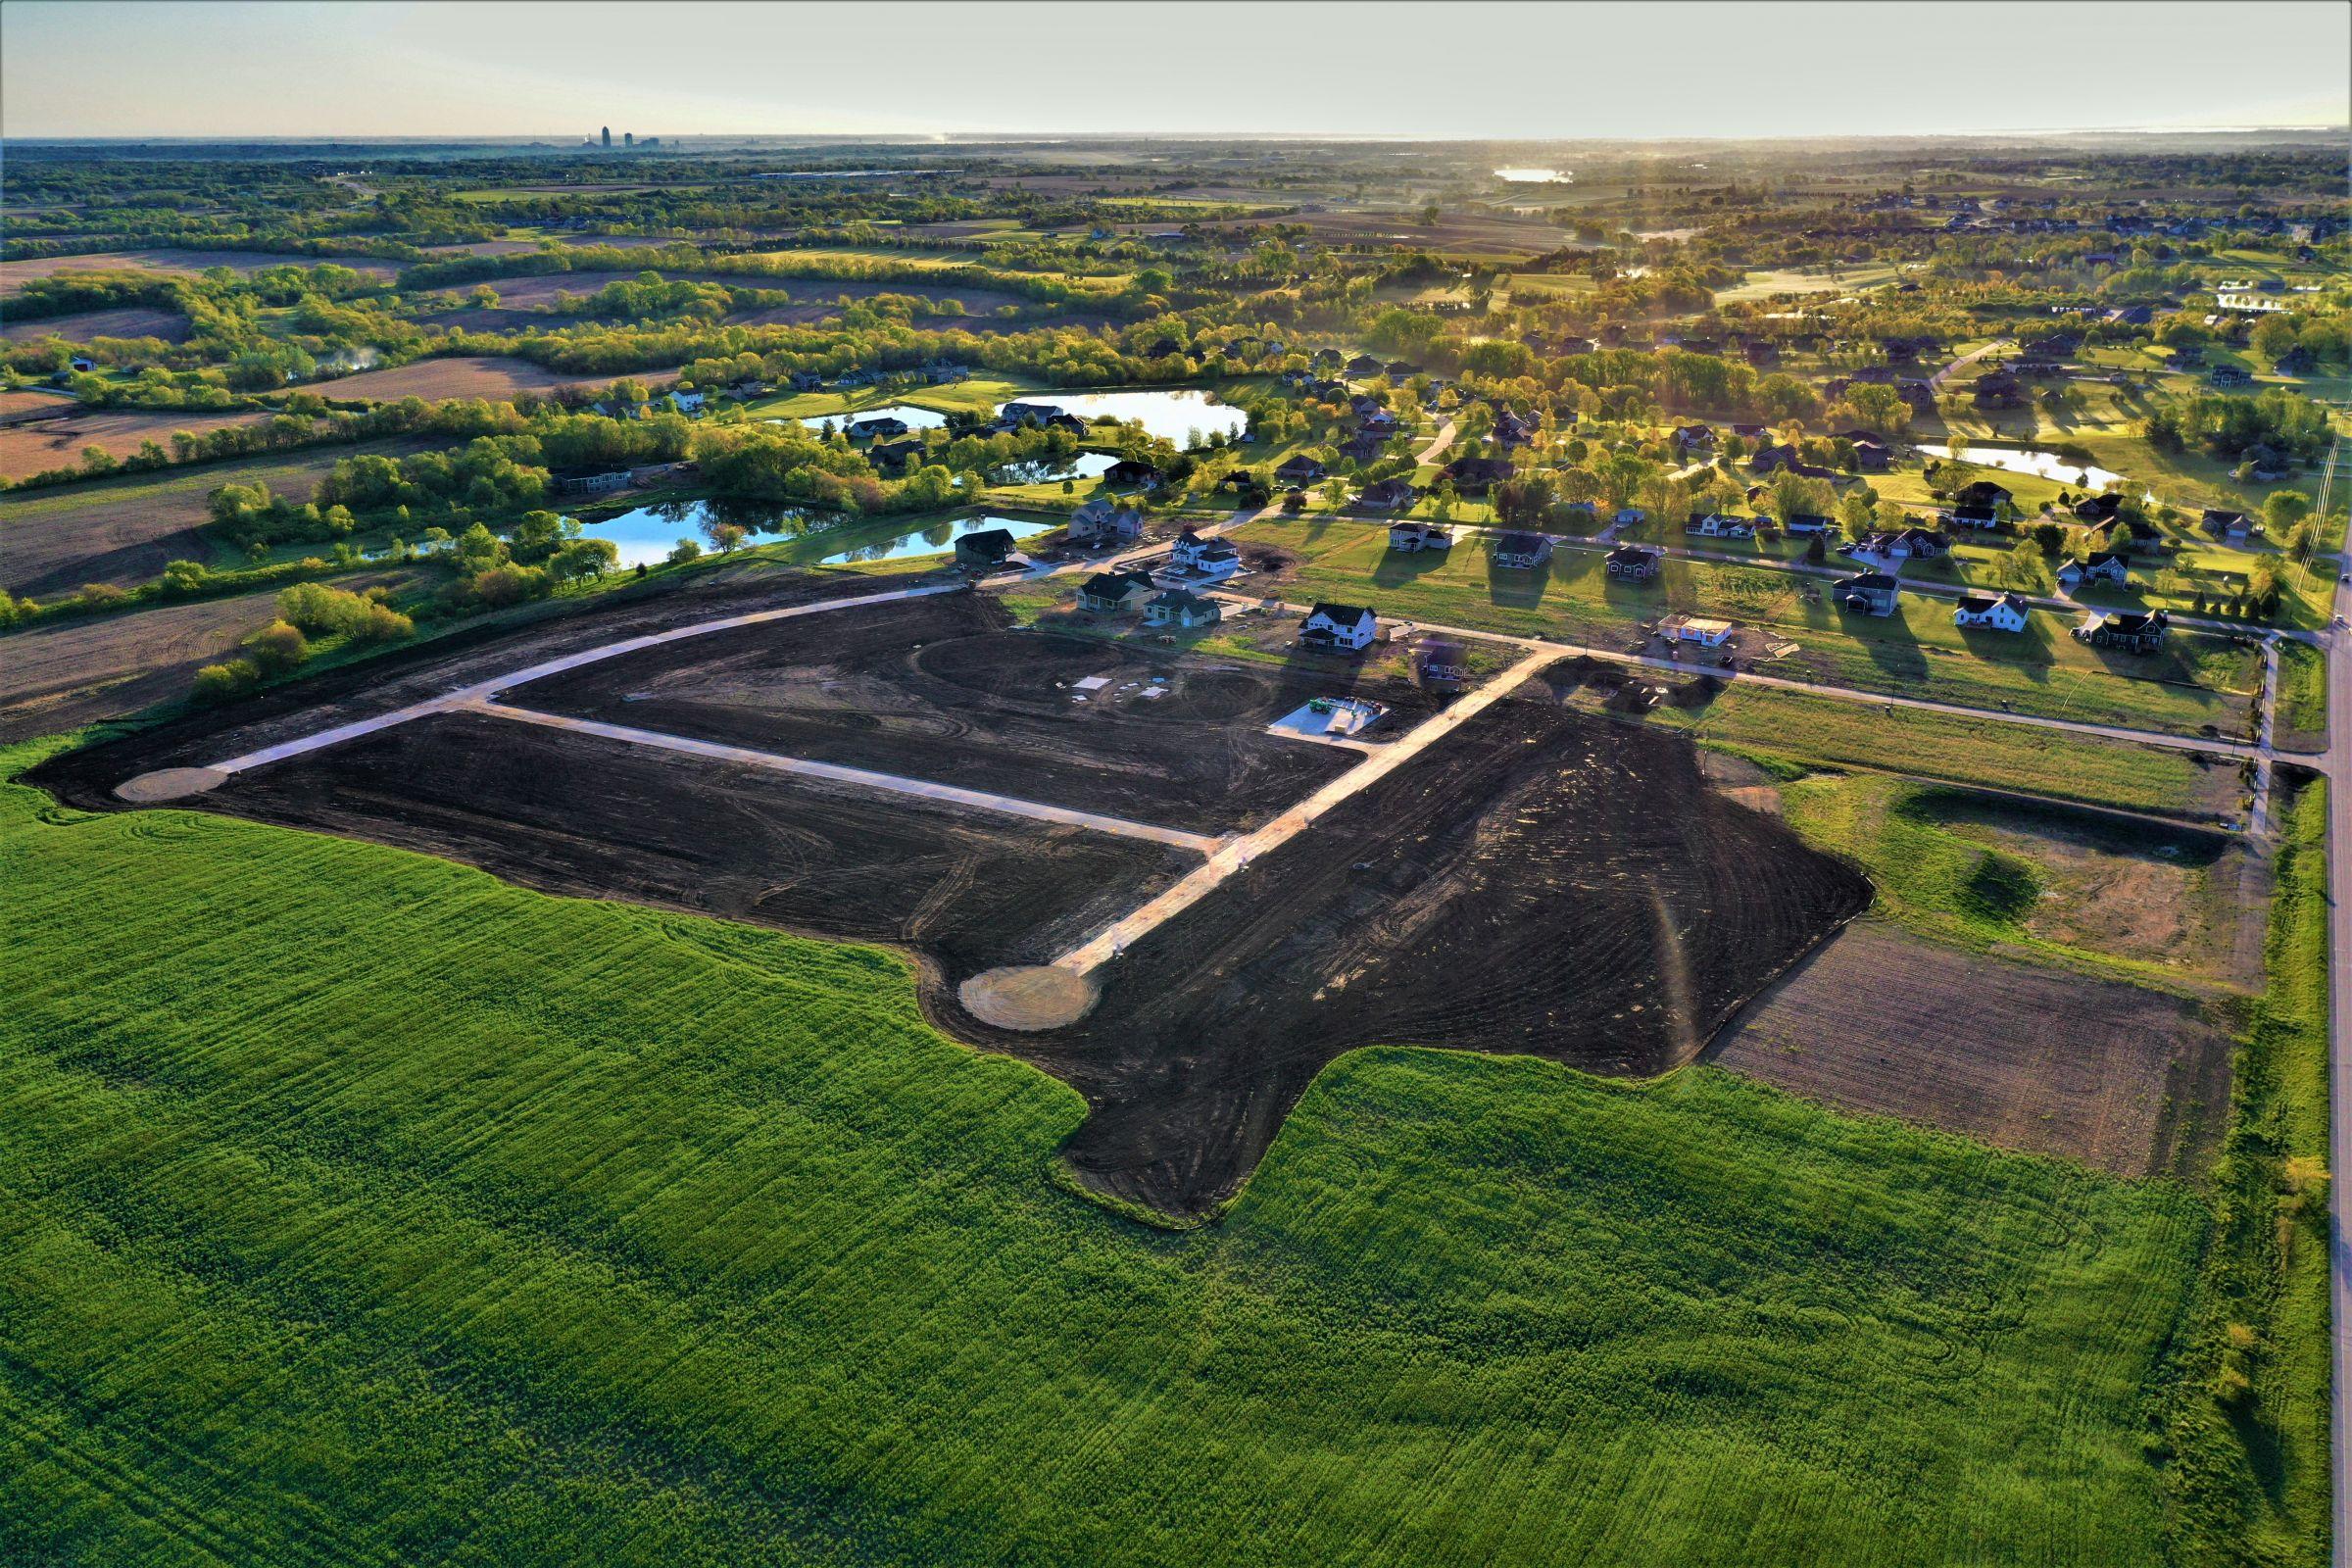 development-land-warren-county-iowa-0-acres-listing-number-14249-8-2021-07-09-171739.jpg